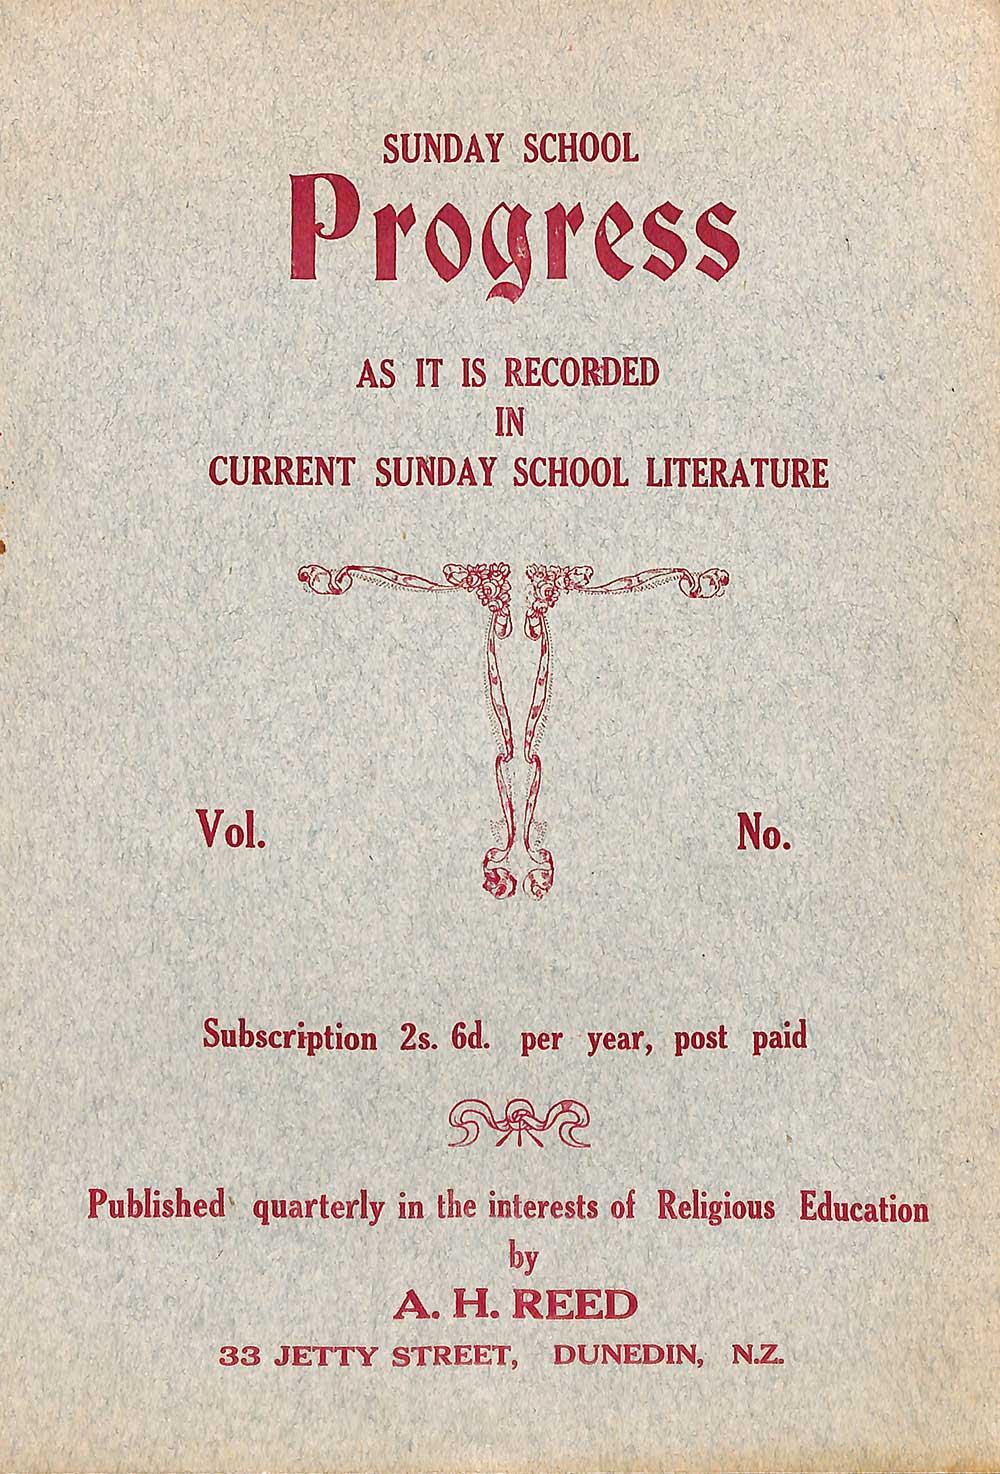 A.H. Reed (editor). <em>Sunday school progress.</em> Dunedin: A.H. Reed Ltd., November 1926.